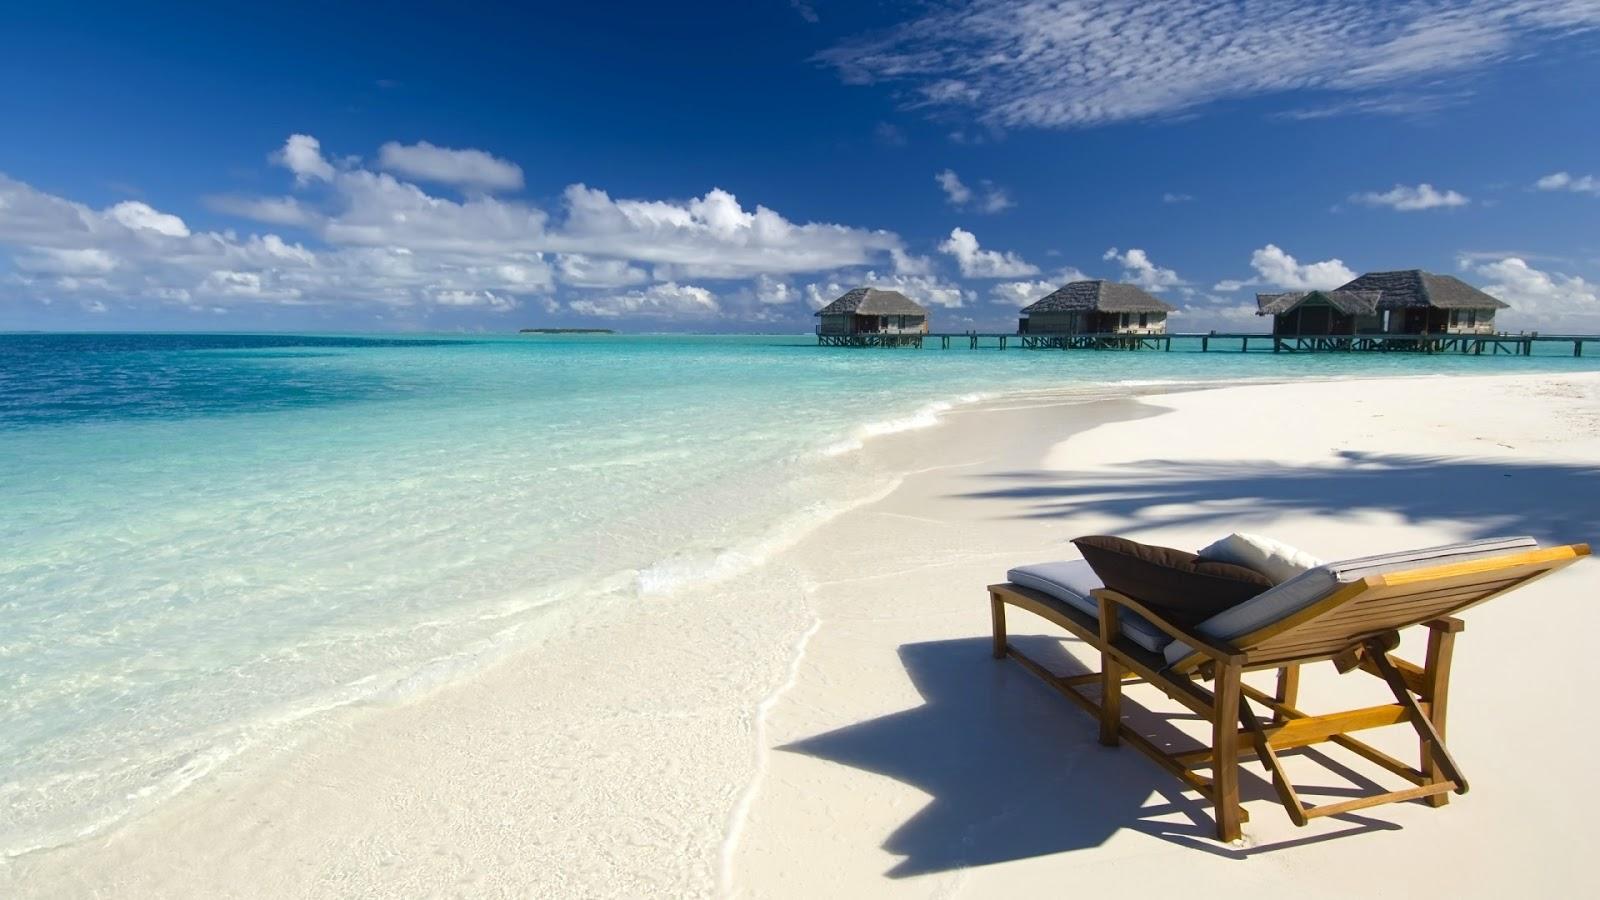 White Sandy Beach To Warm Your Days